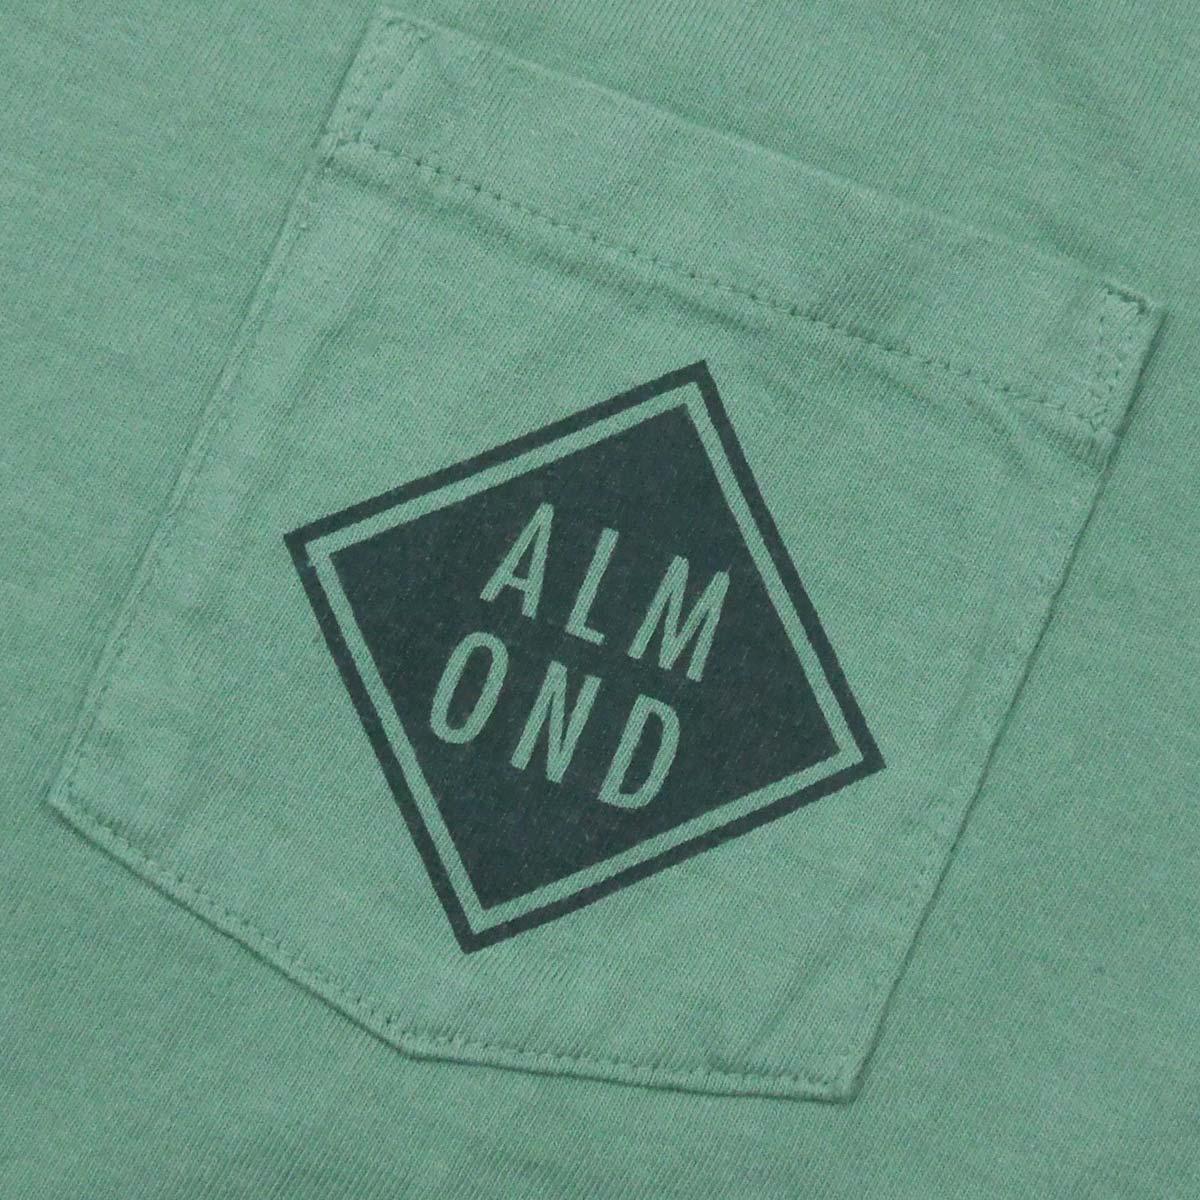 Almond Surf アーモンドサーフボードデザイン DIAMOND S/S TEE